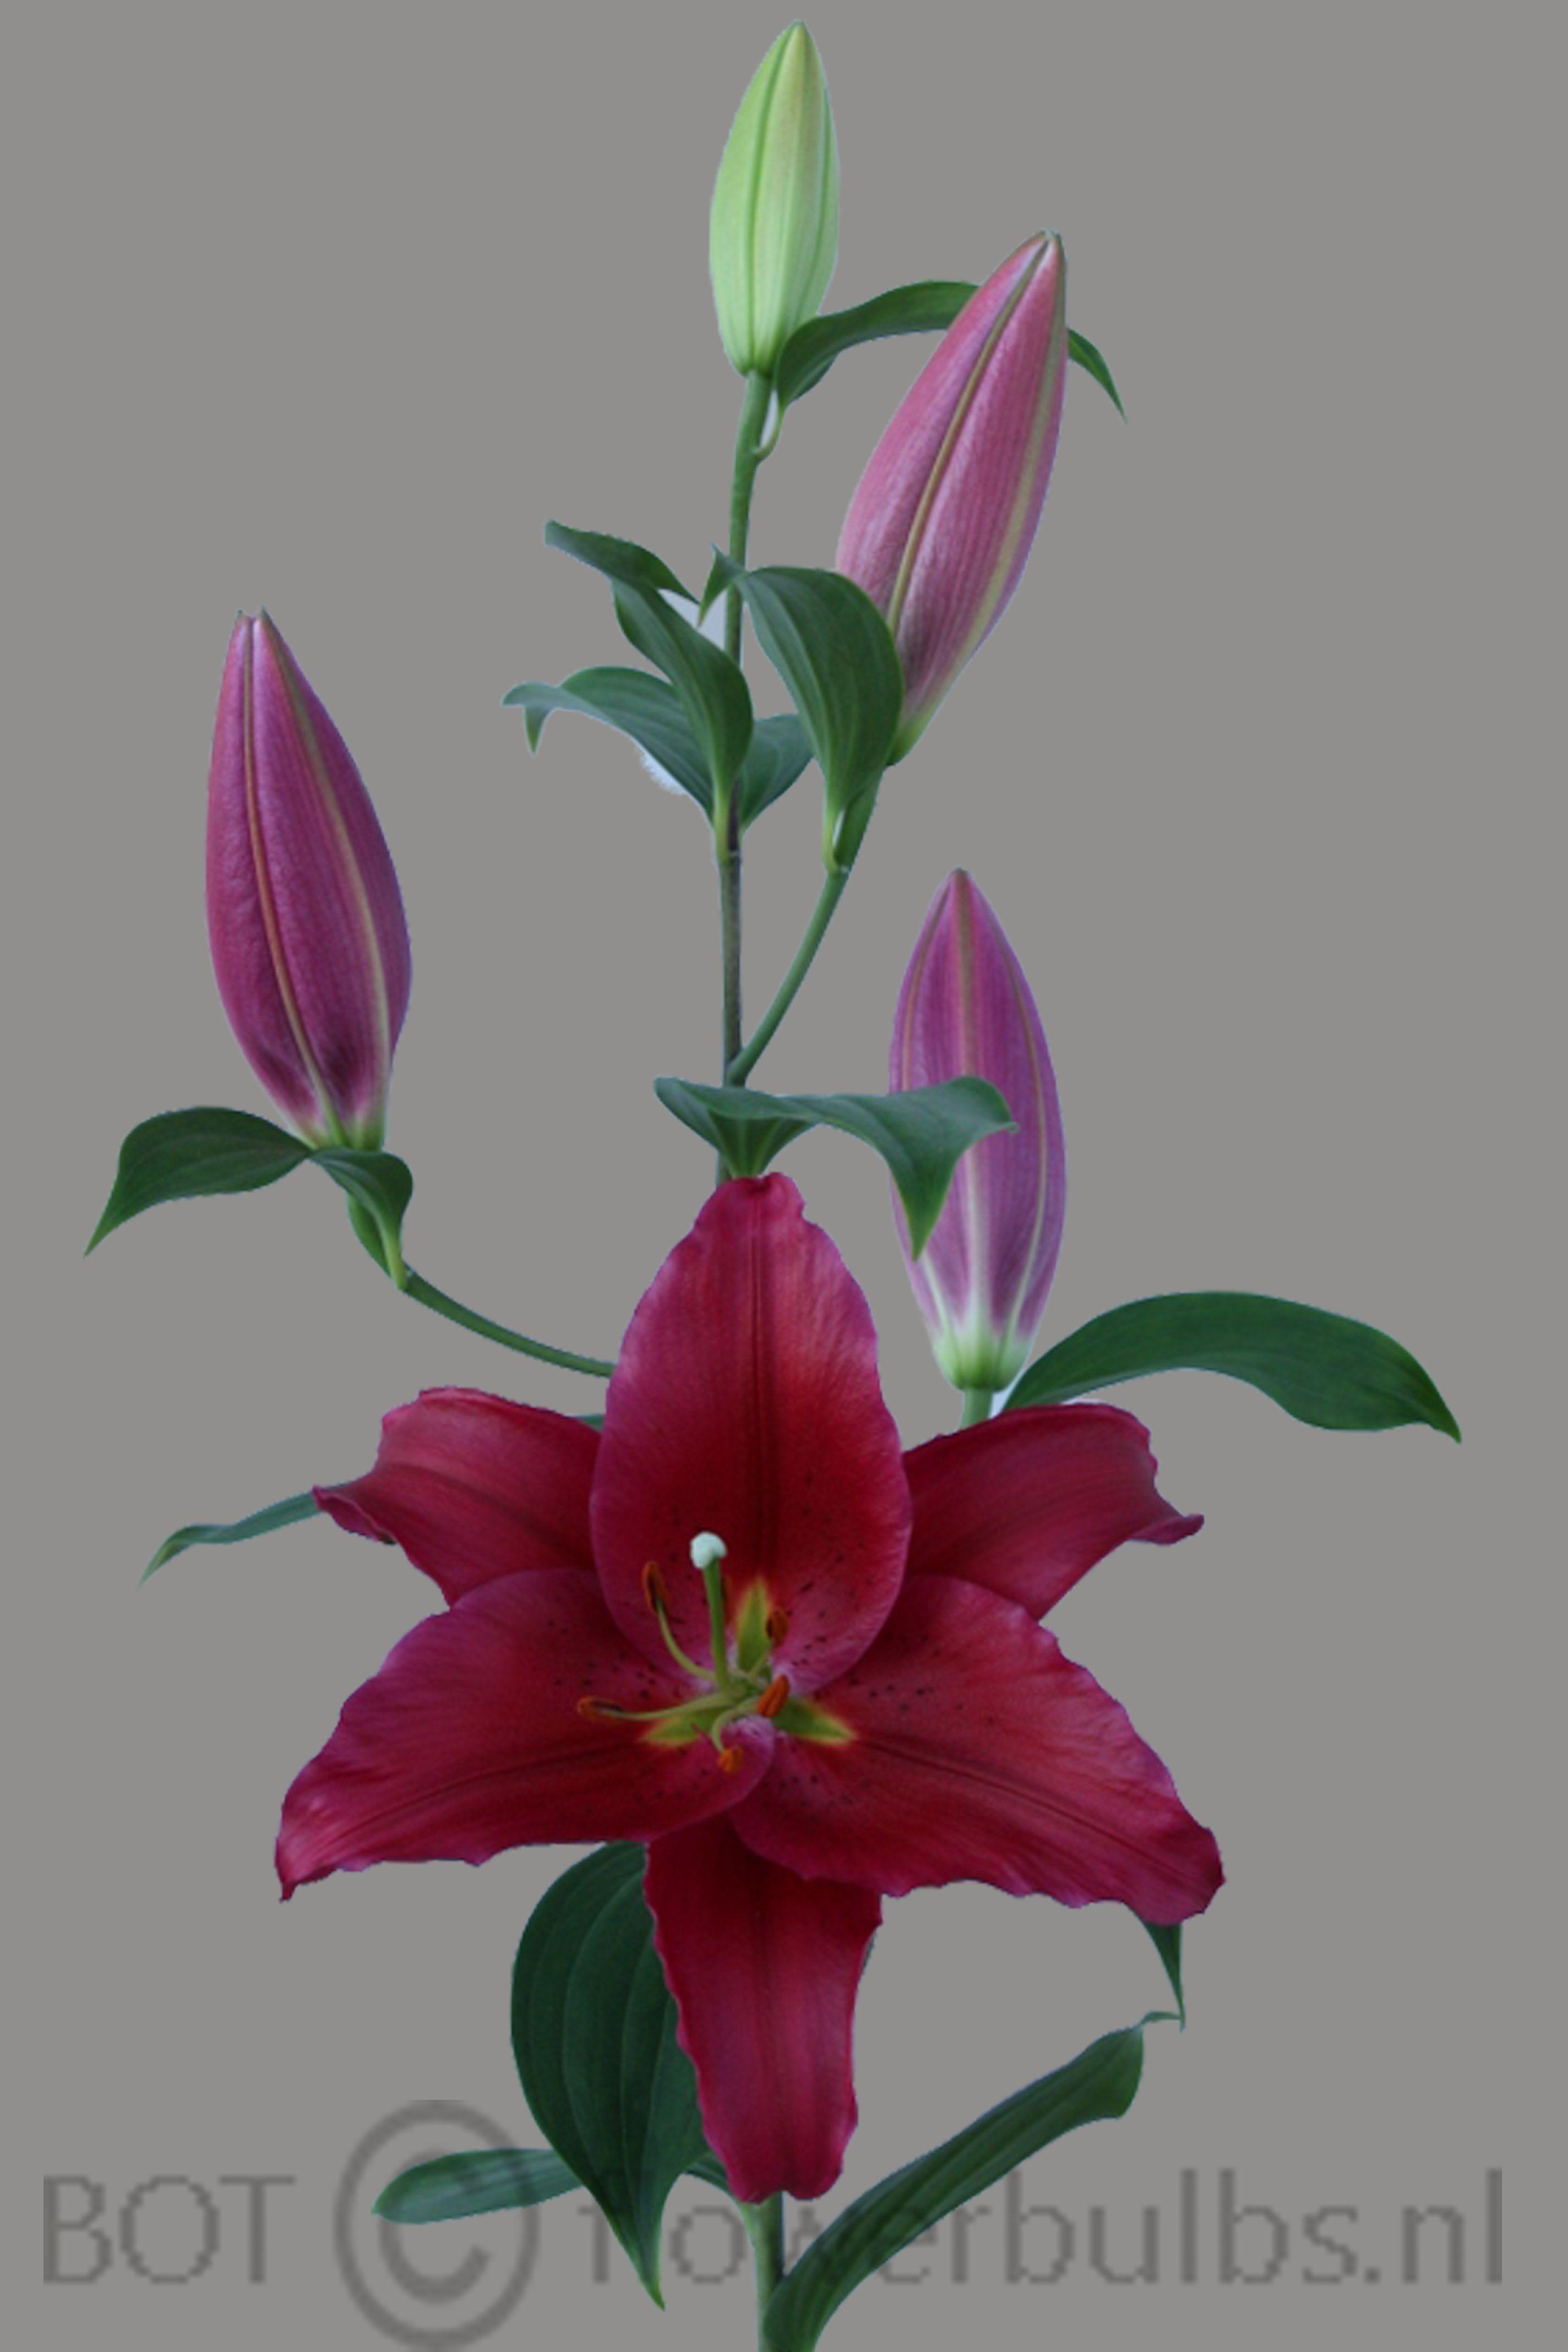 Name: Arabian Red #bot #flowerbulbs #lilium #flower #bulbs #bulbos #bulbosas #lirio #lirios #variedades #bubos #holanda #bloembollen #bloemen #bollen #bulbs #exporter #exporteur #floriculture #flowers #gladioli #gladiool #horticulture #iris #lelie #lily #preparation #prepareren #irissen #Andijk #collection #keurmerk #oriental #asiatic #la #ot #holland